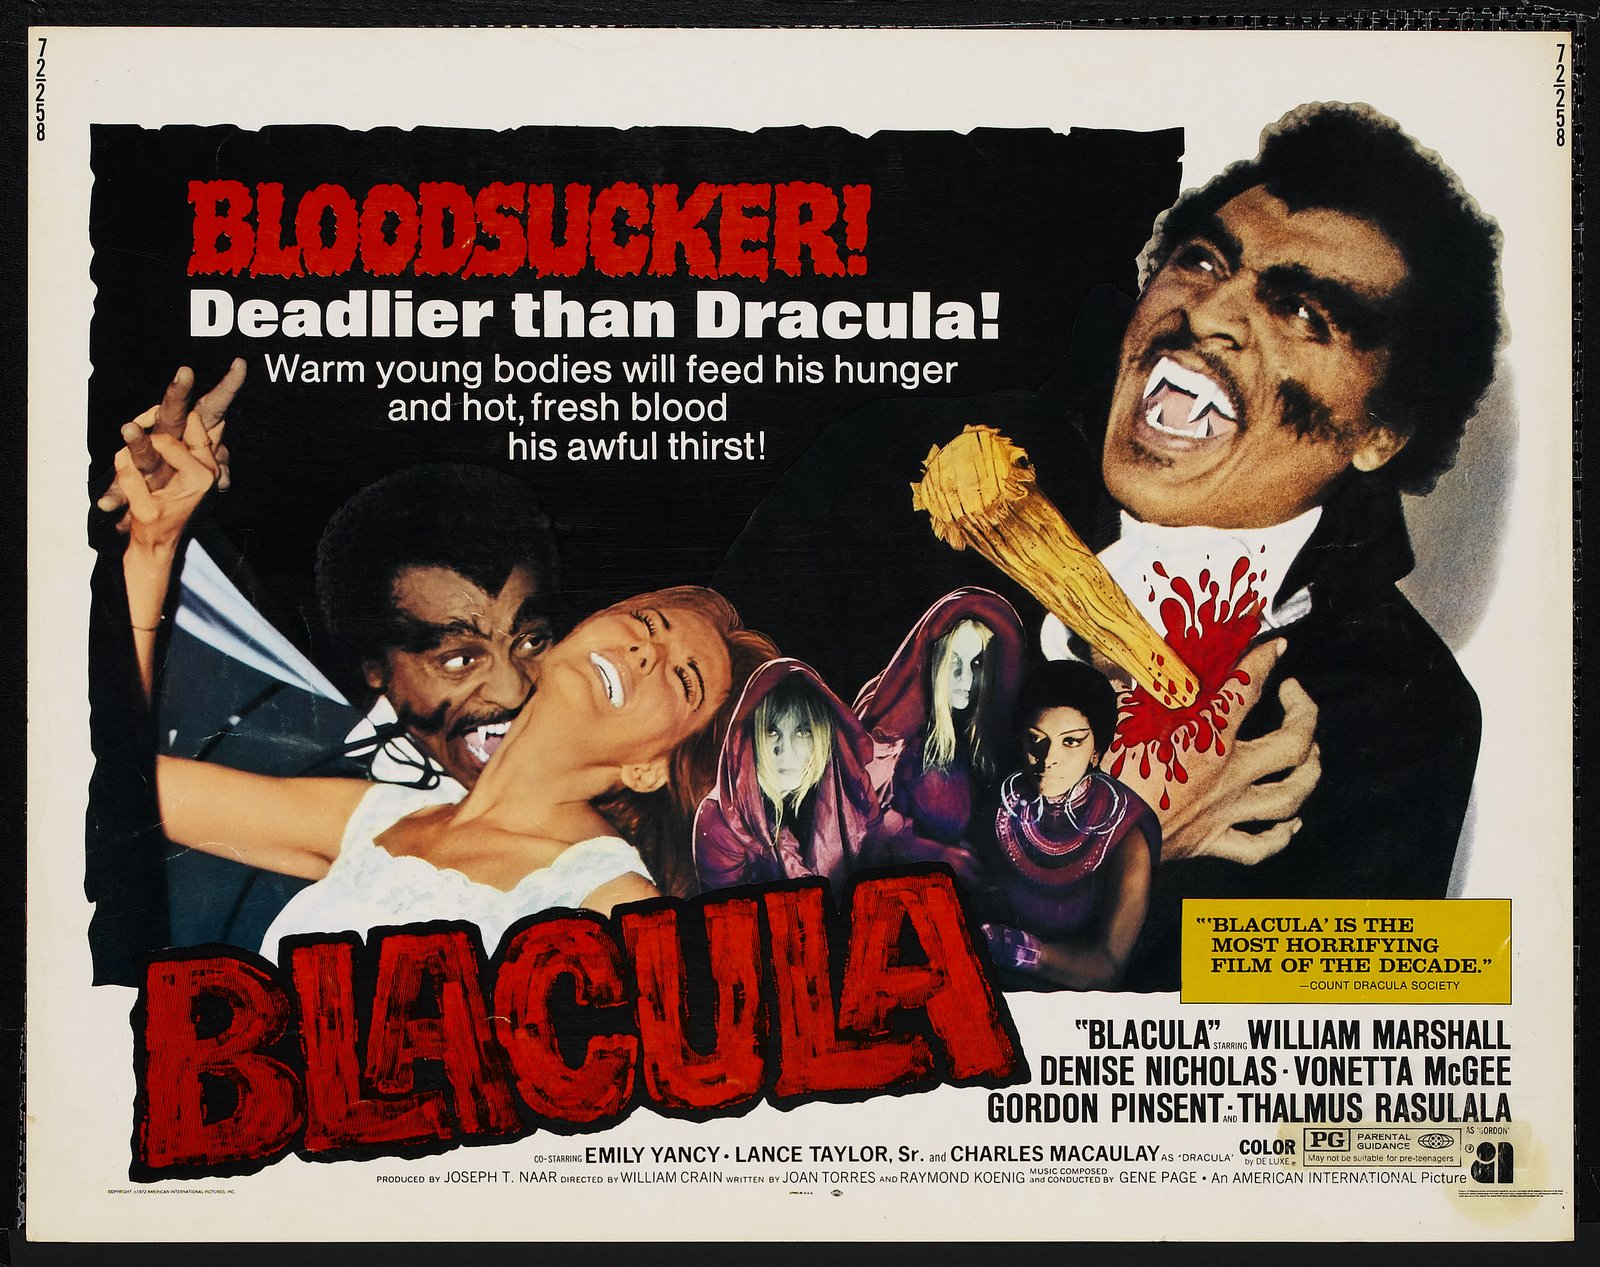 Blacula (1972) - poster